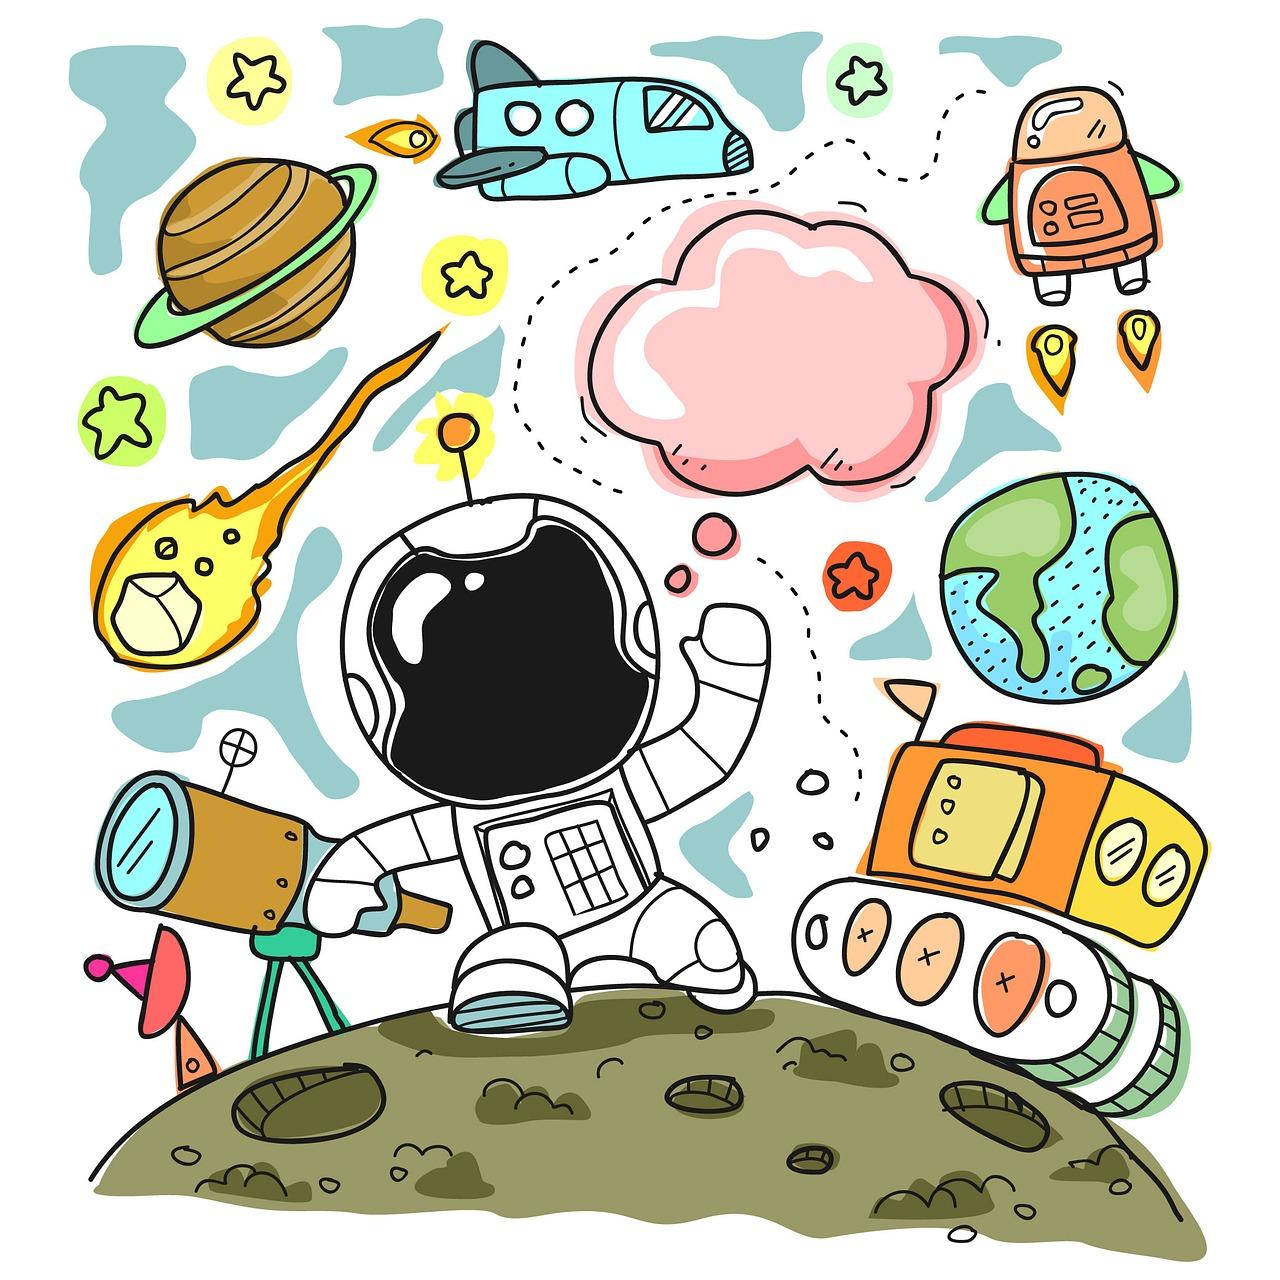 Sketch Cute Child Free Image On Pixabay